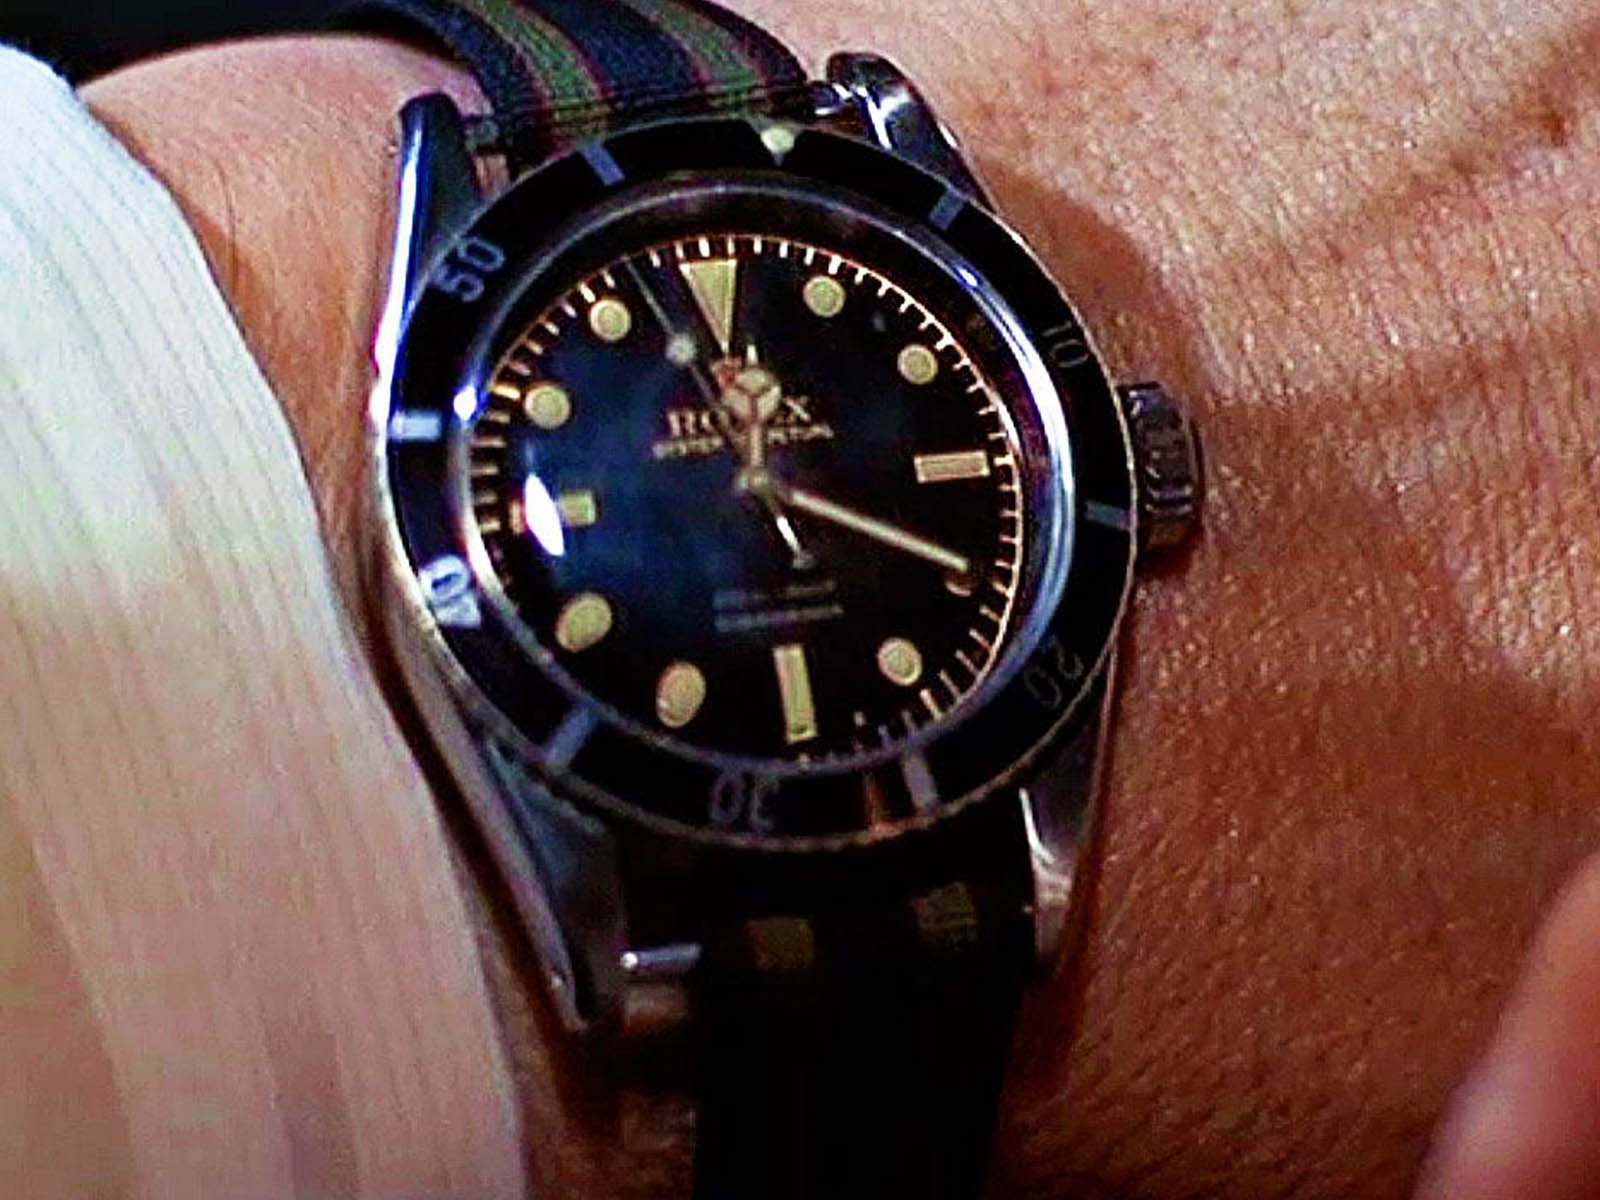 sean-connery-rolex-submariner-6538-james-bond-007-dr-no-1.jpg